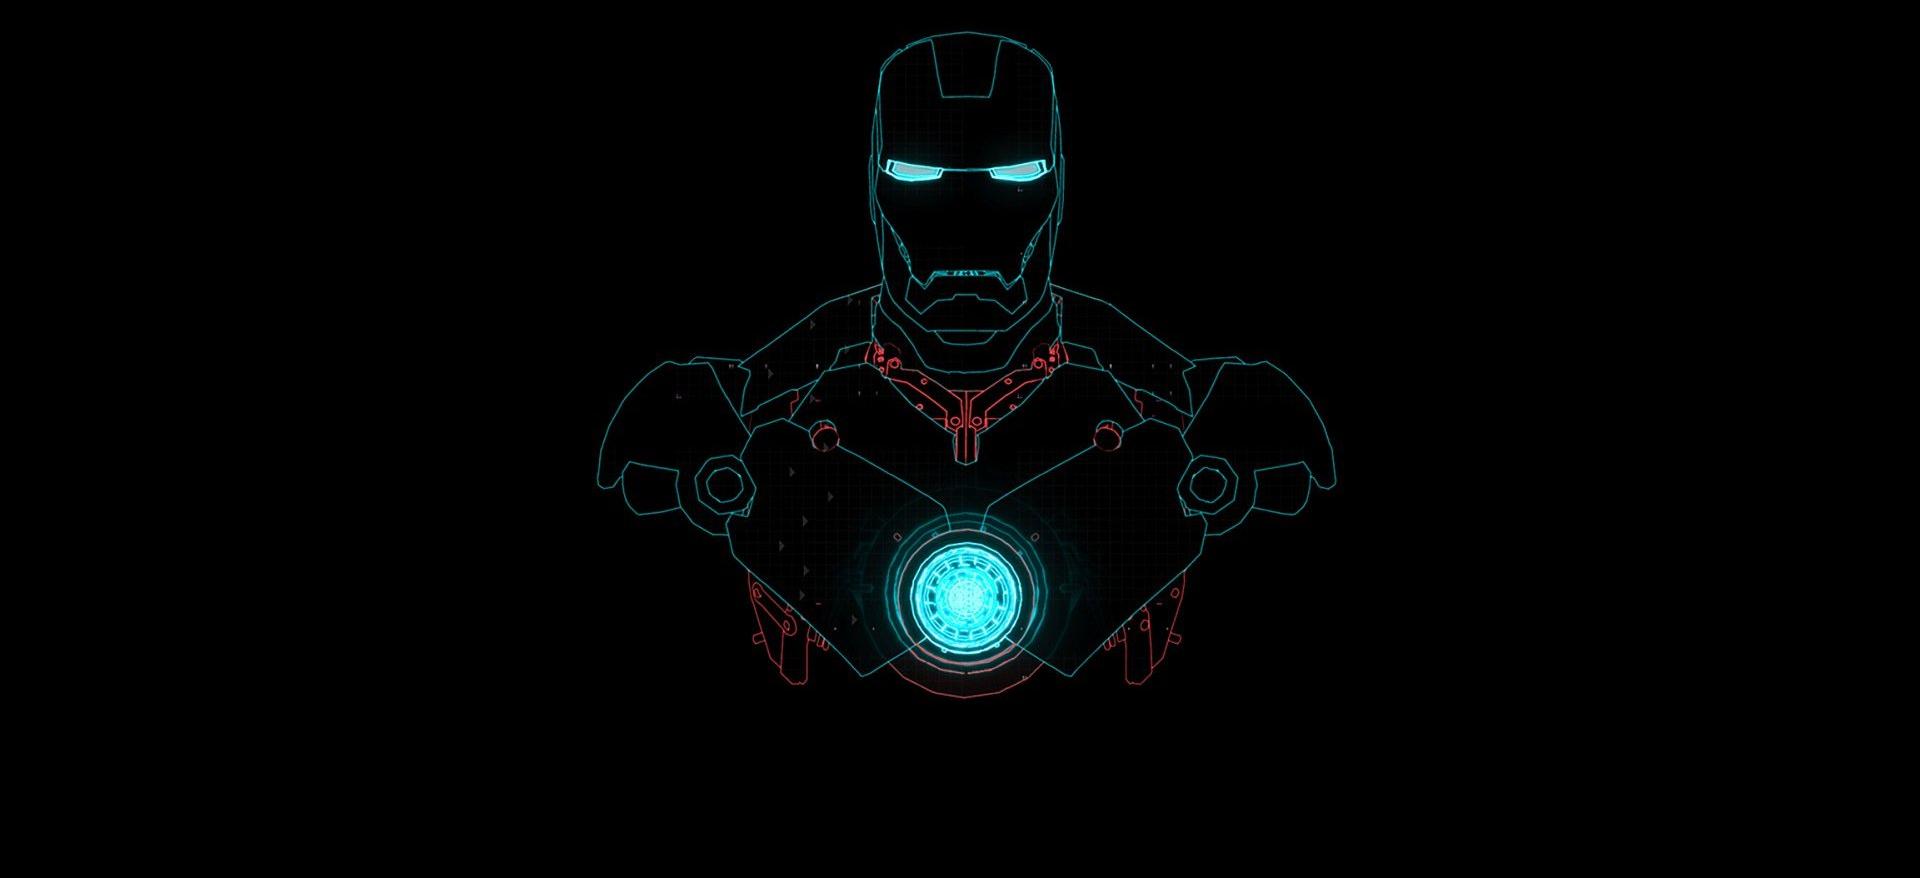 ironman___s_h_i_l_d__os_desktop_wallpaper_by_yash1331-d5gdb64.png